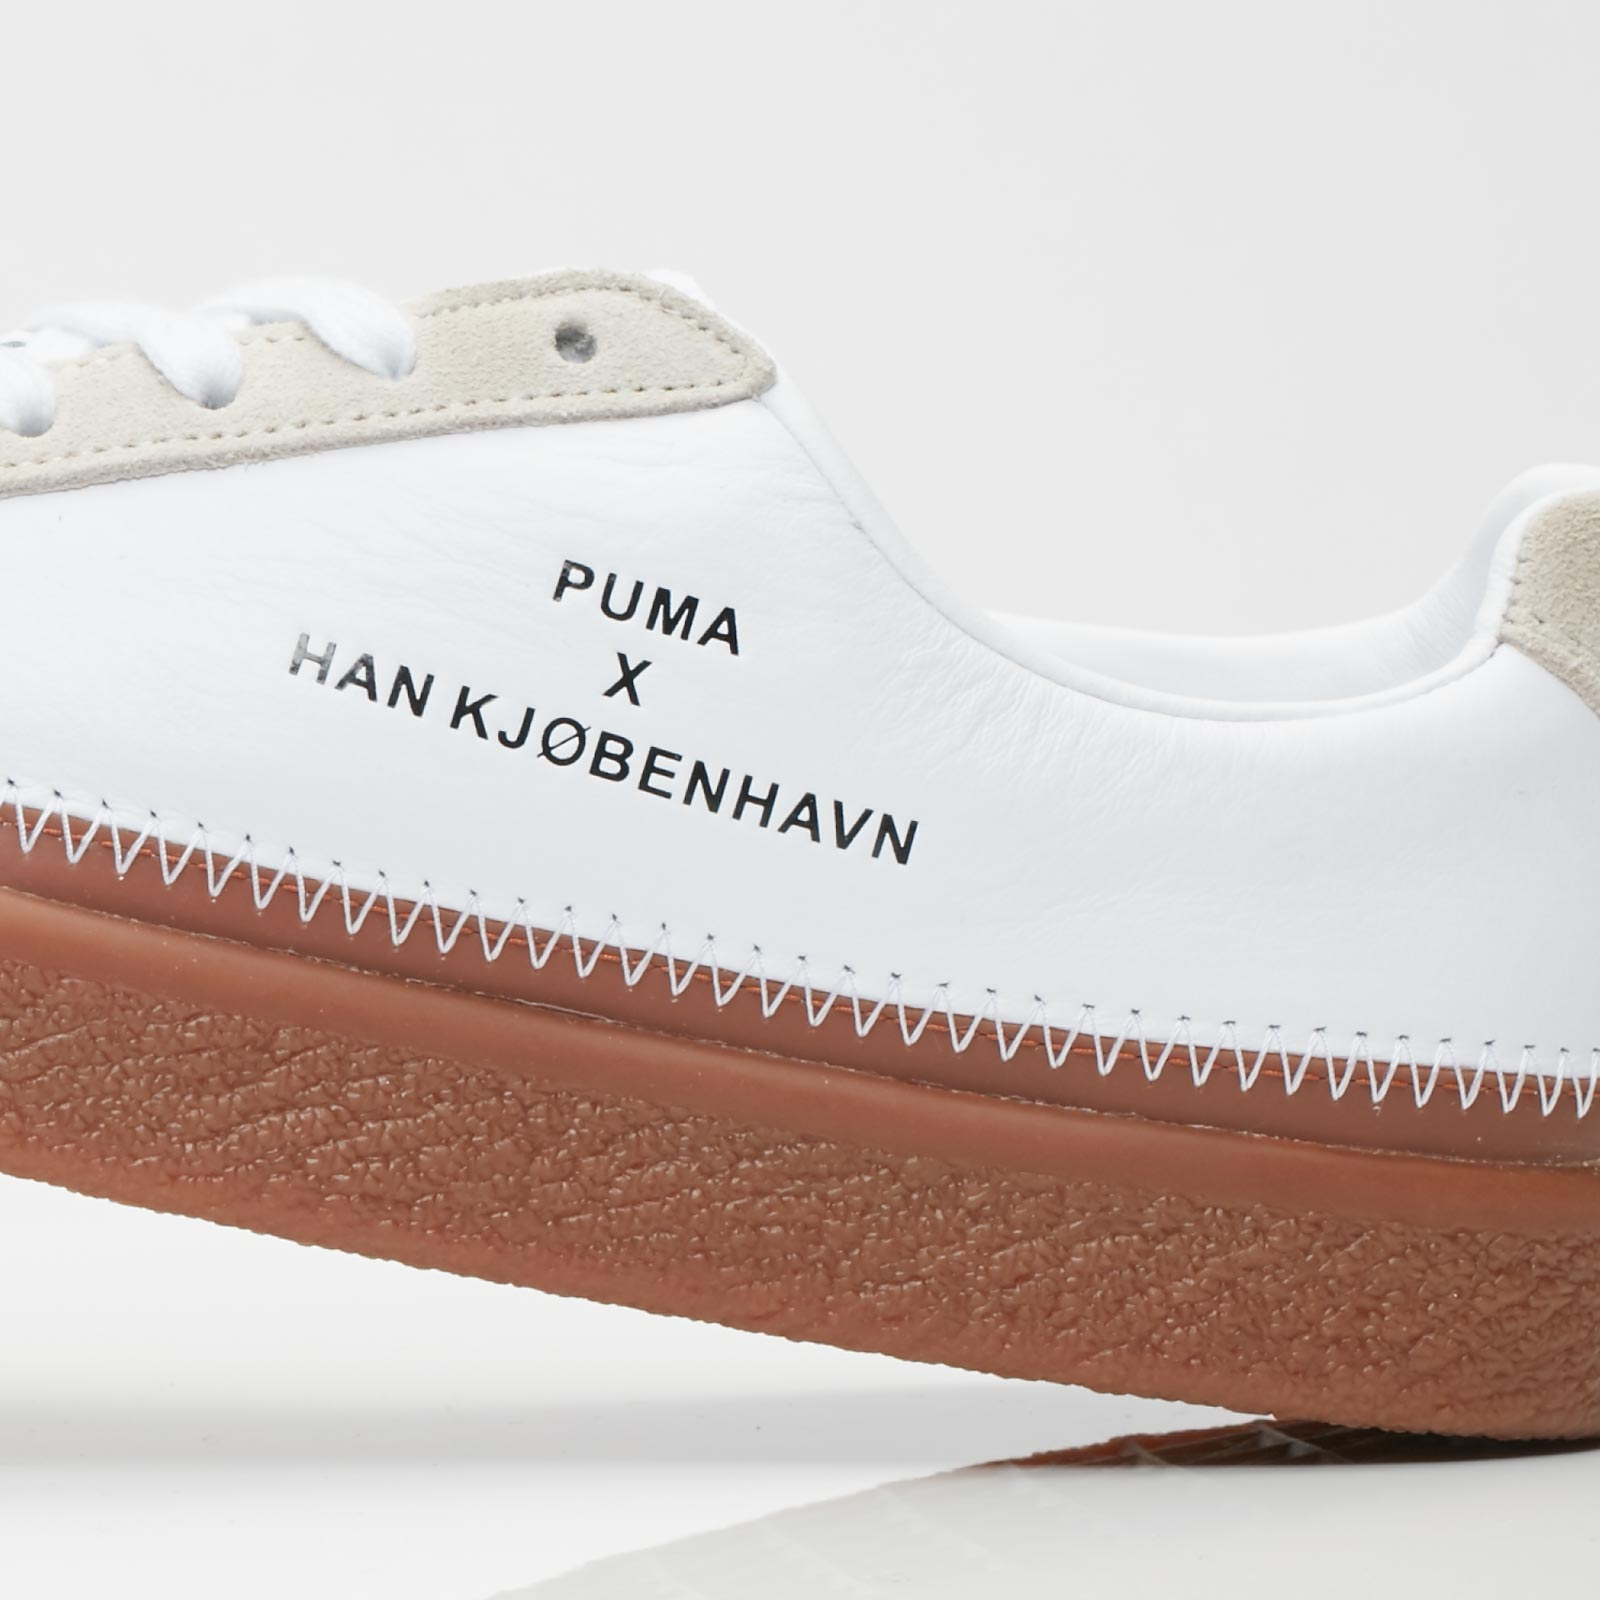 Puma Clyde Stitched x Han Kjøbenhavn